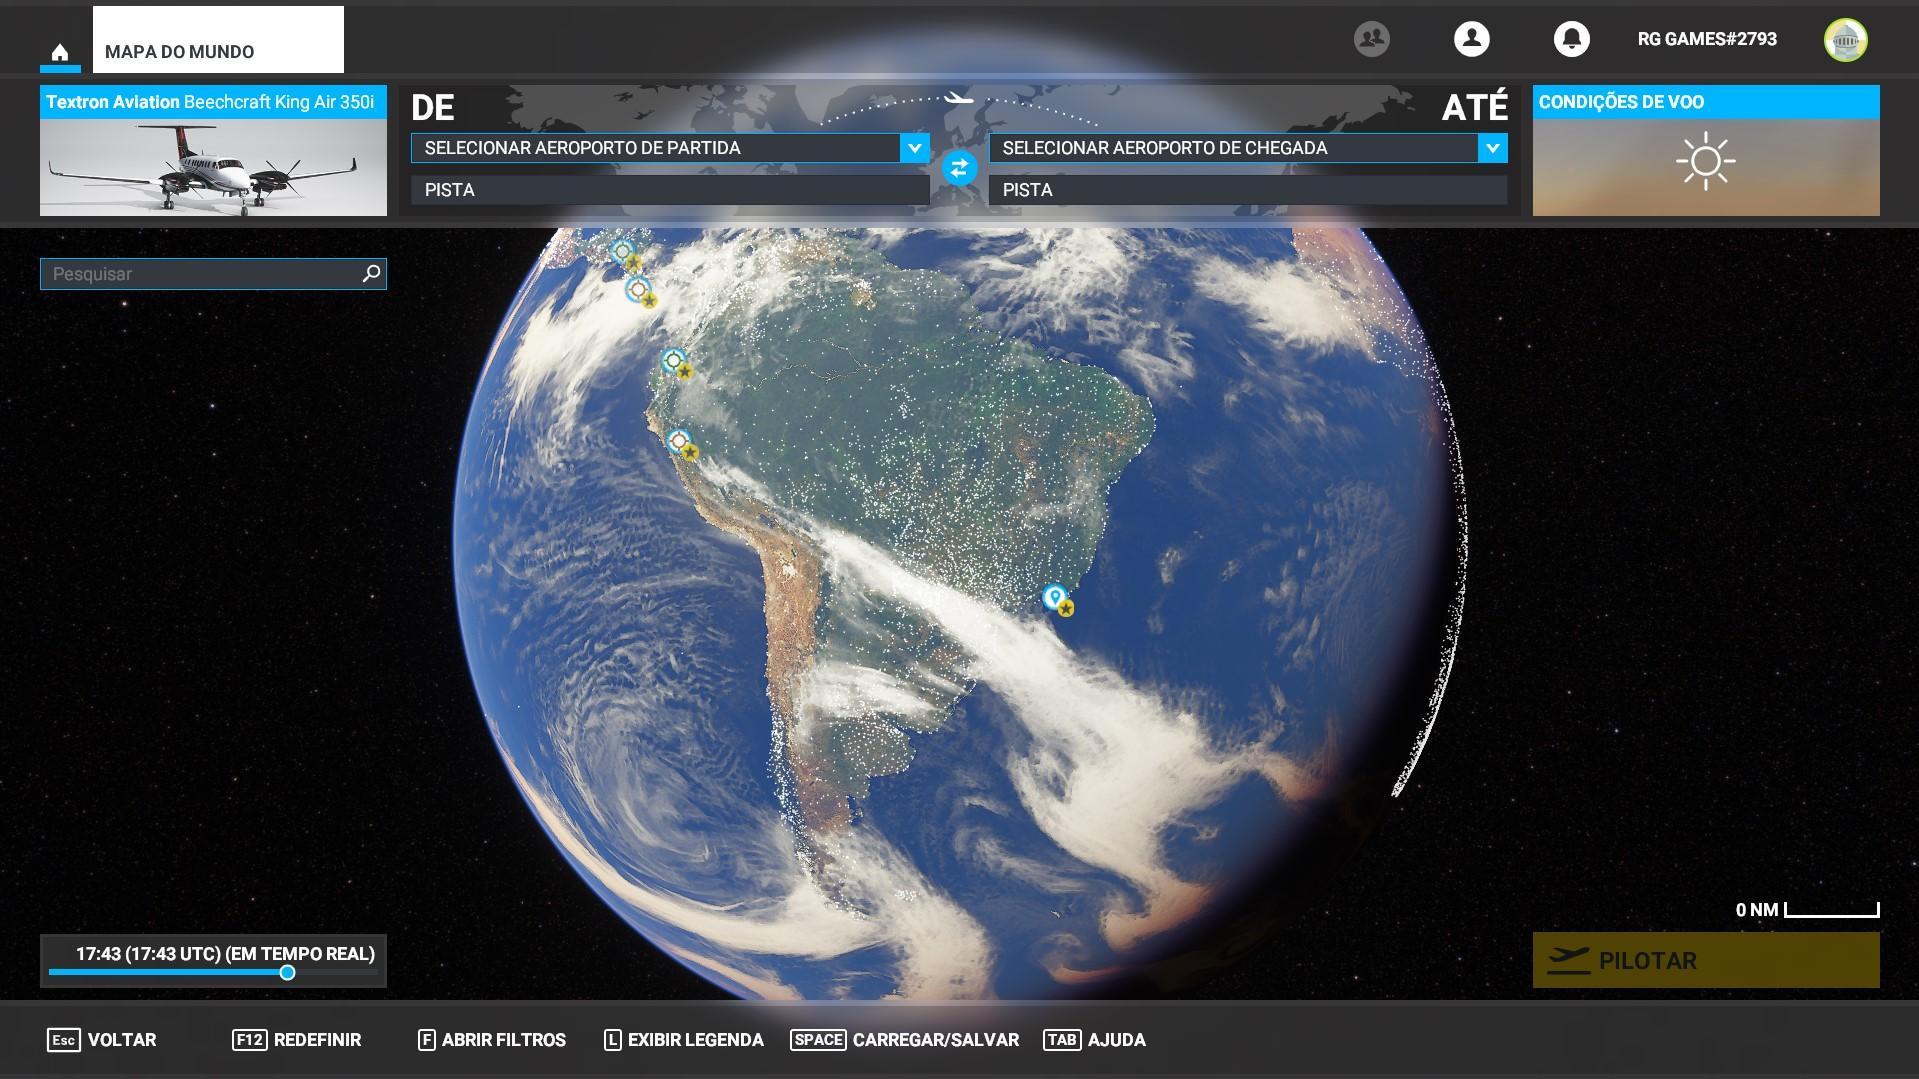 Mapa do Mundo - Flight Simulator